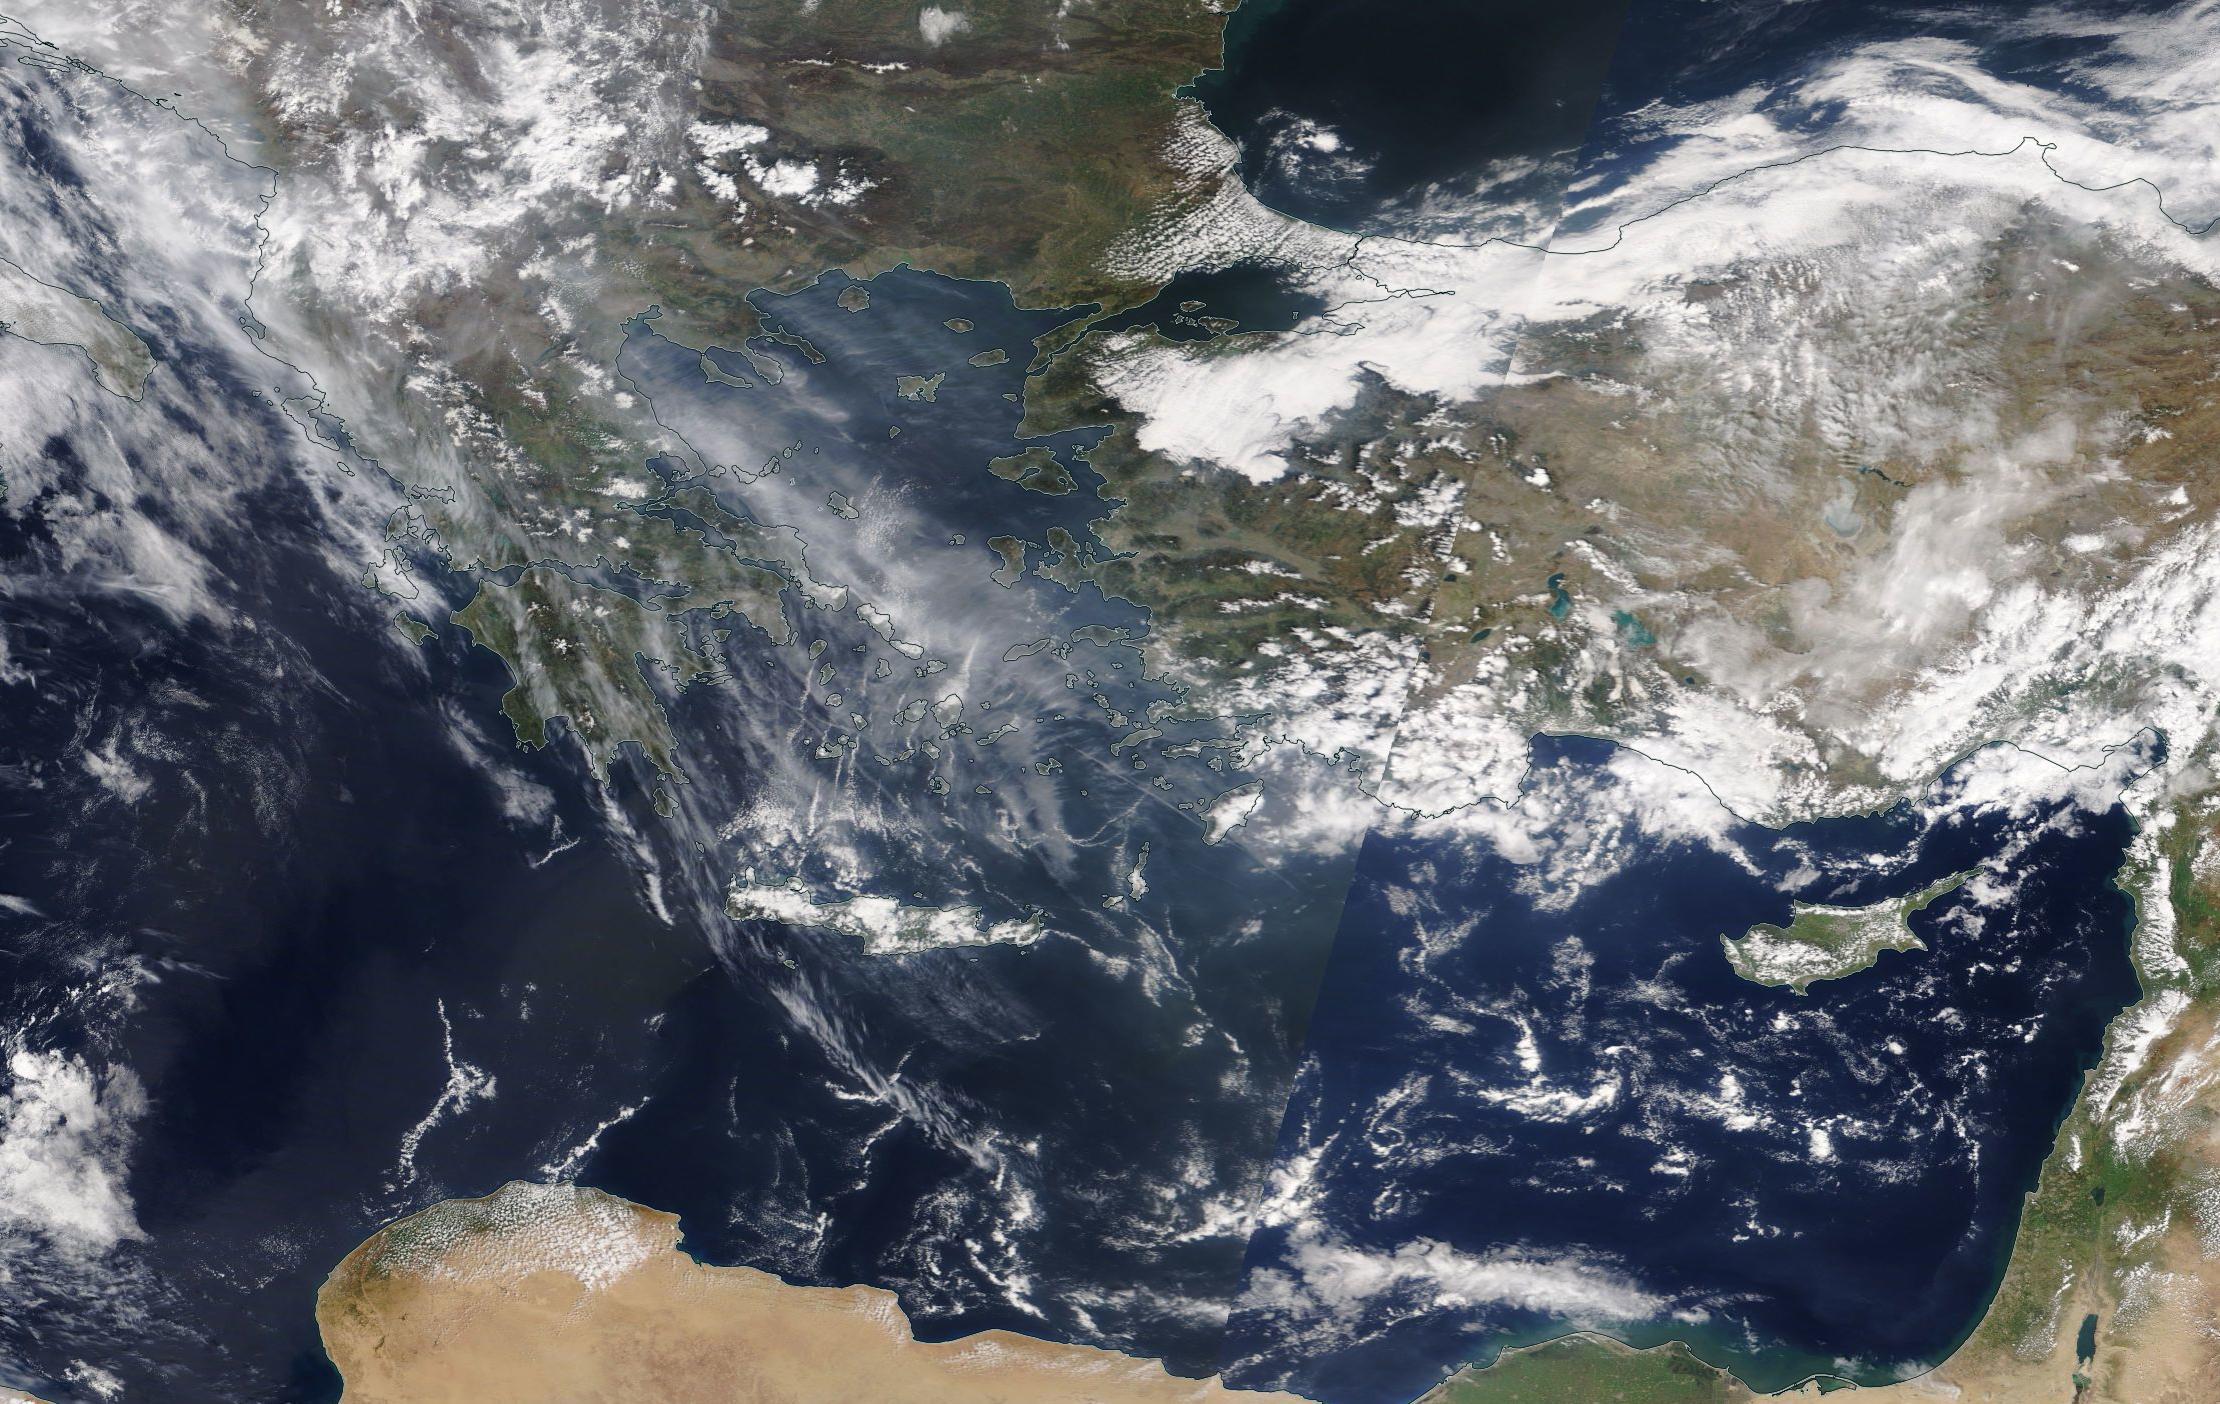 chemtrail geoengineering Greek Islands 3rd April 2019 ... https://go.nasa.gov/2G0aUlJ